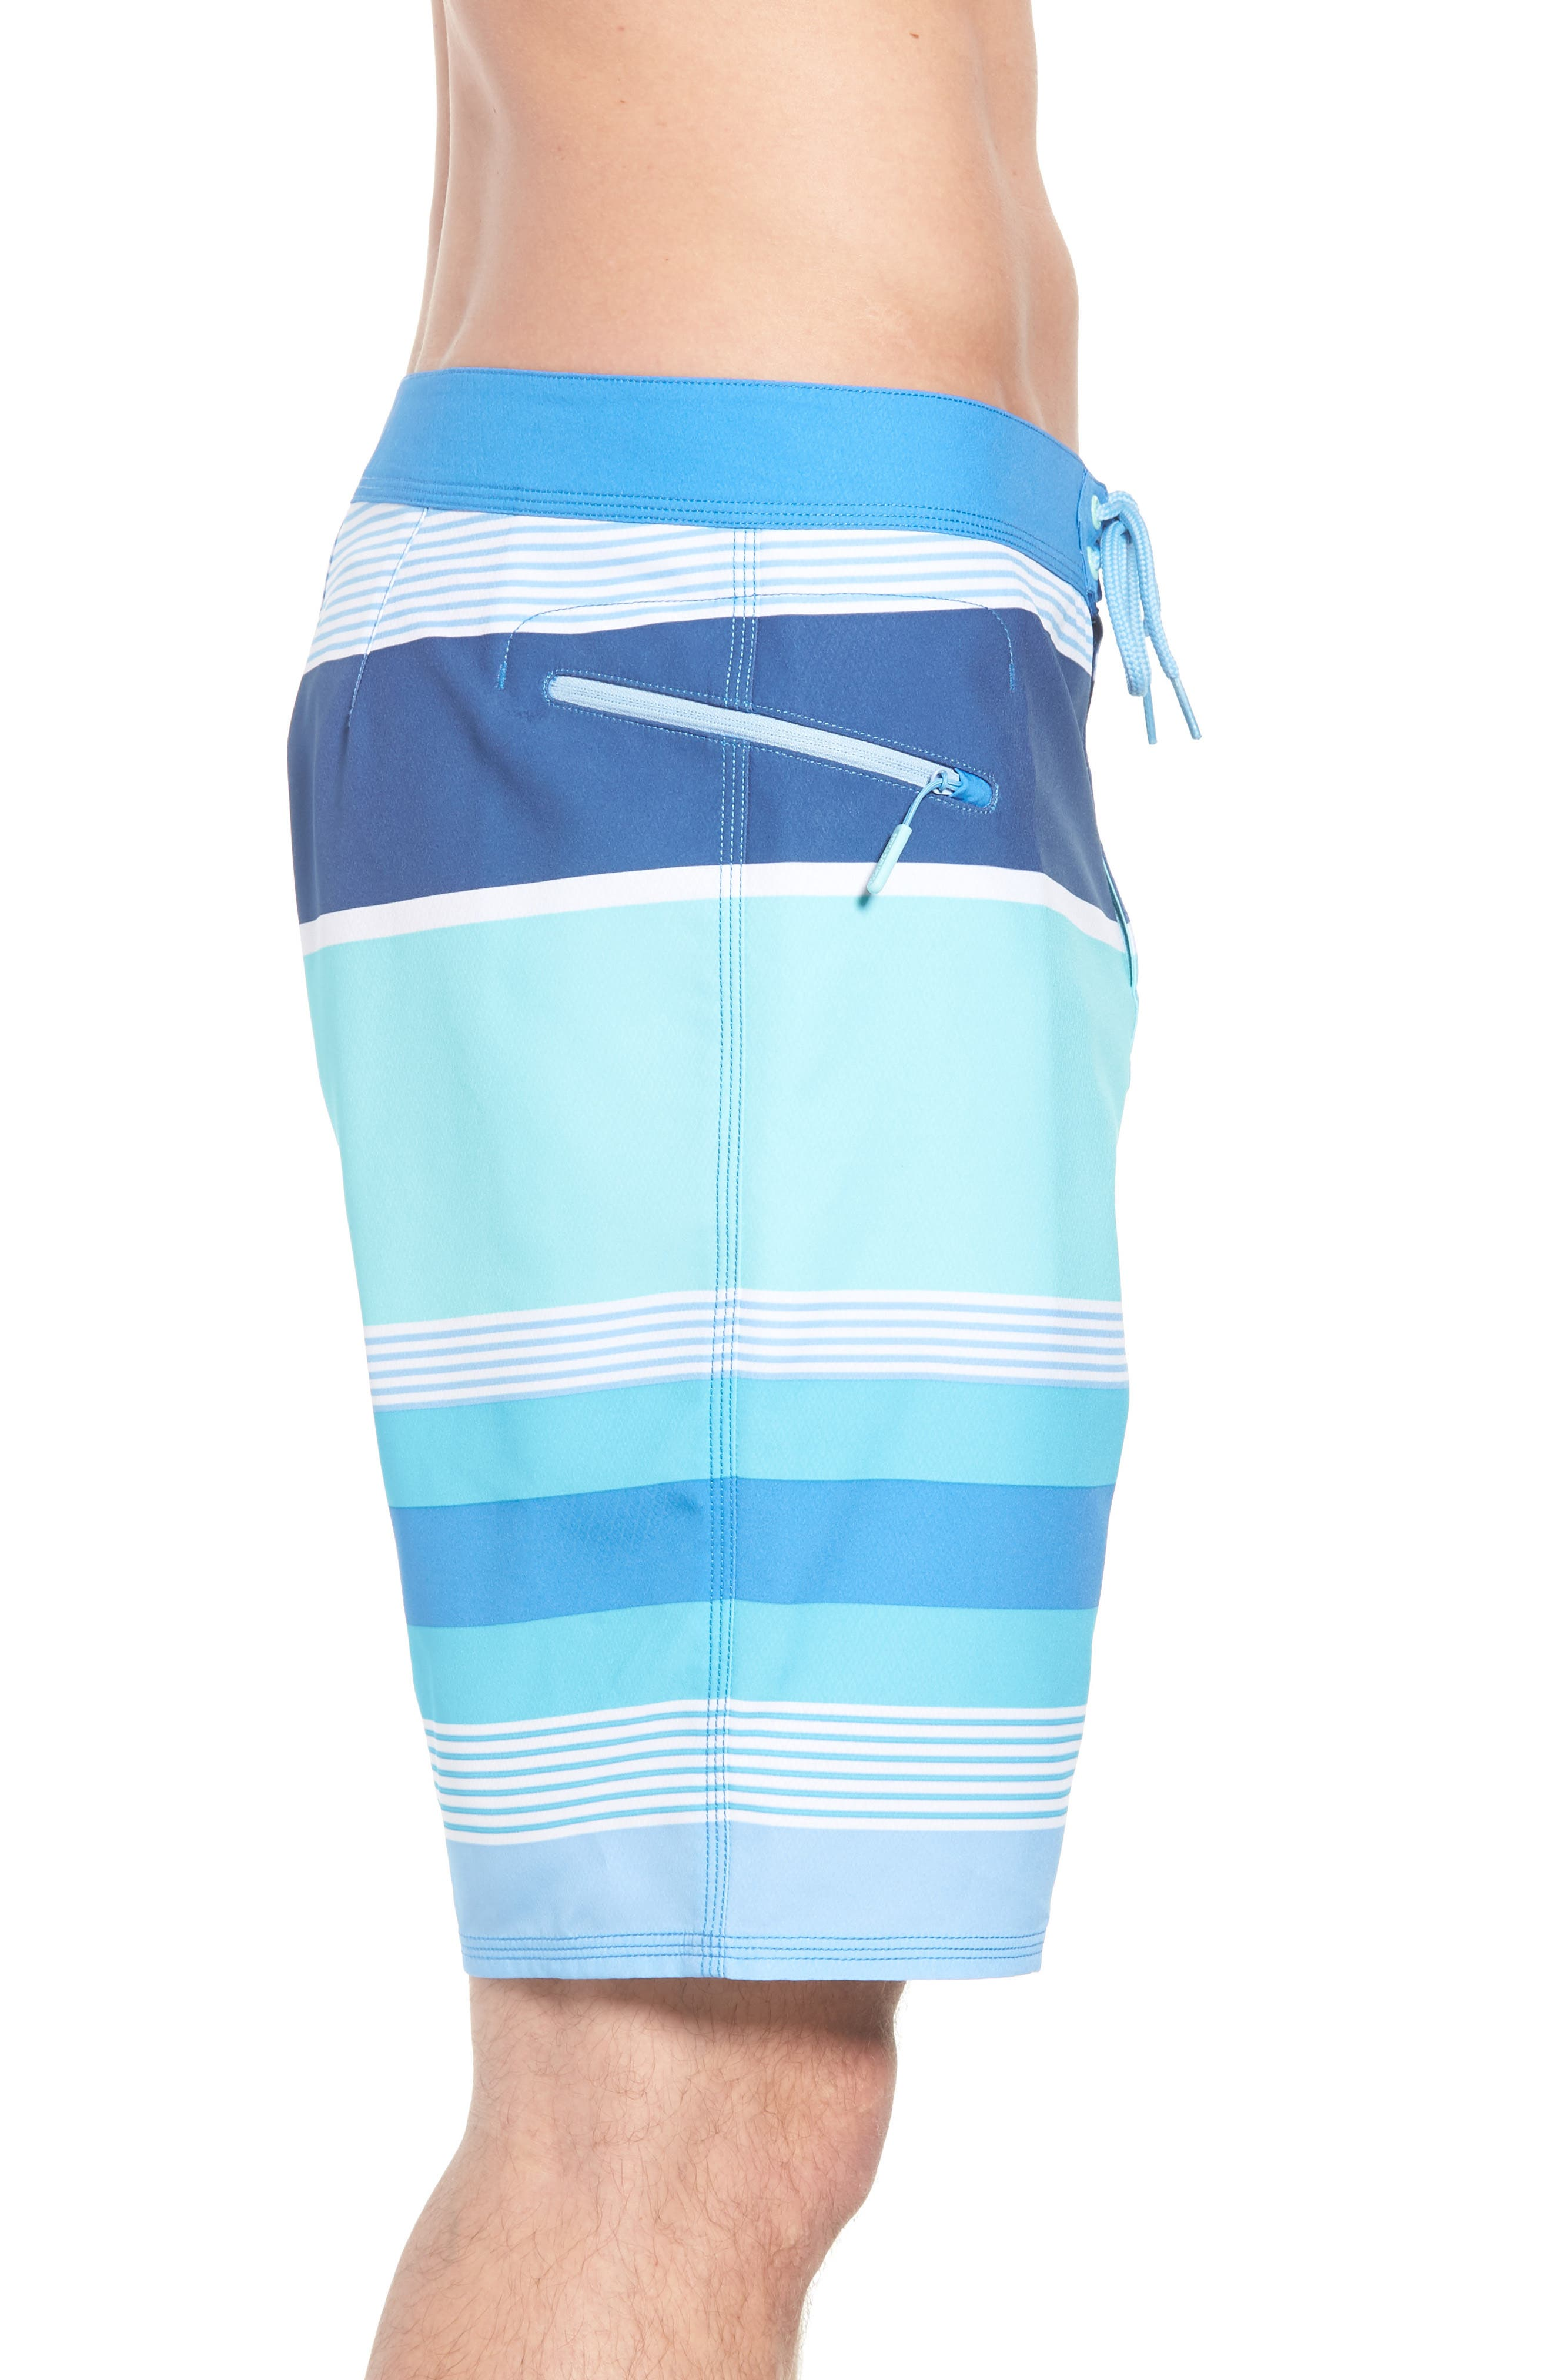 Peaks Island Board Shorts,                             Alternate thumbnail 4, color,                             437